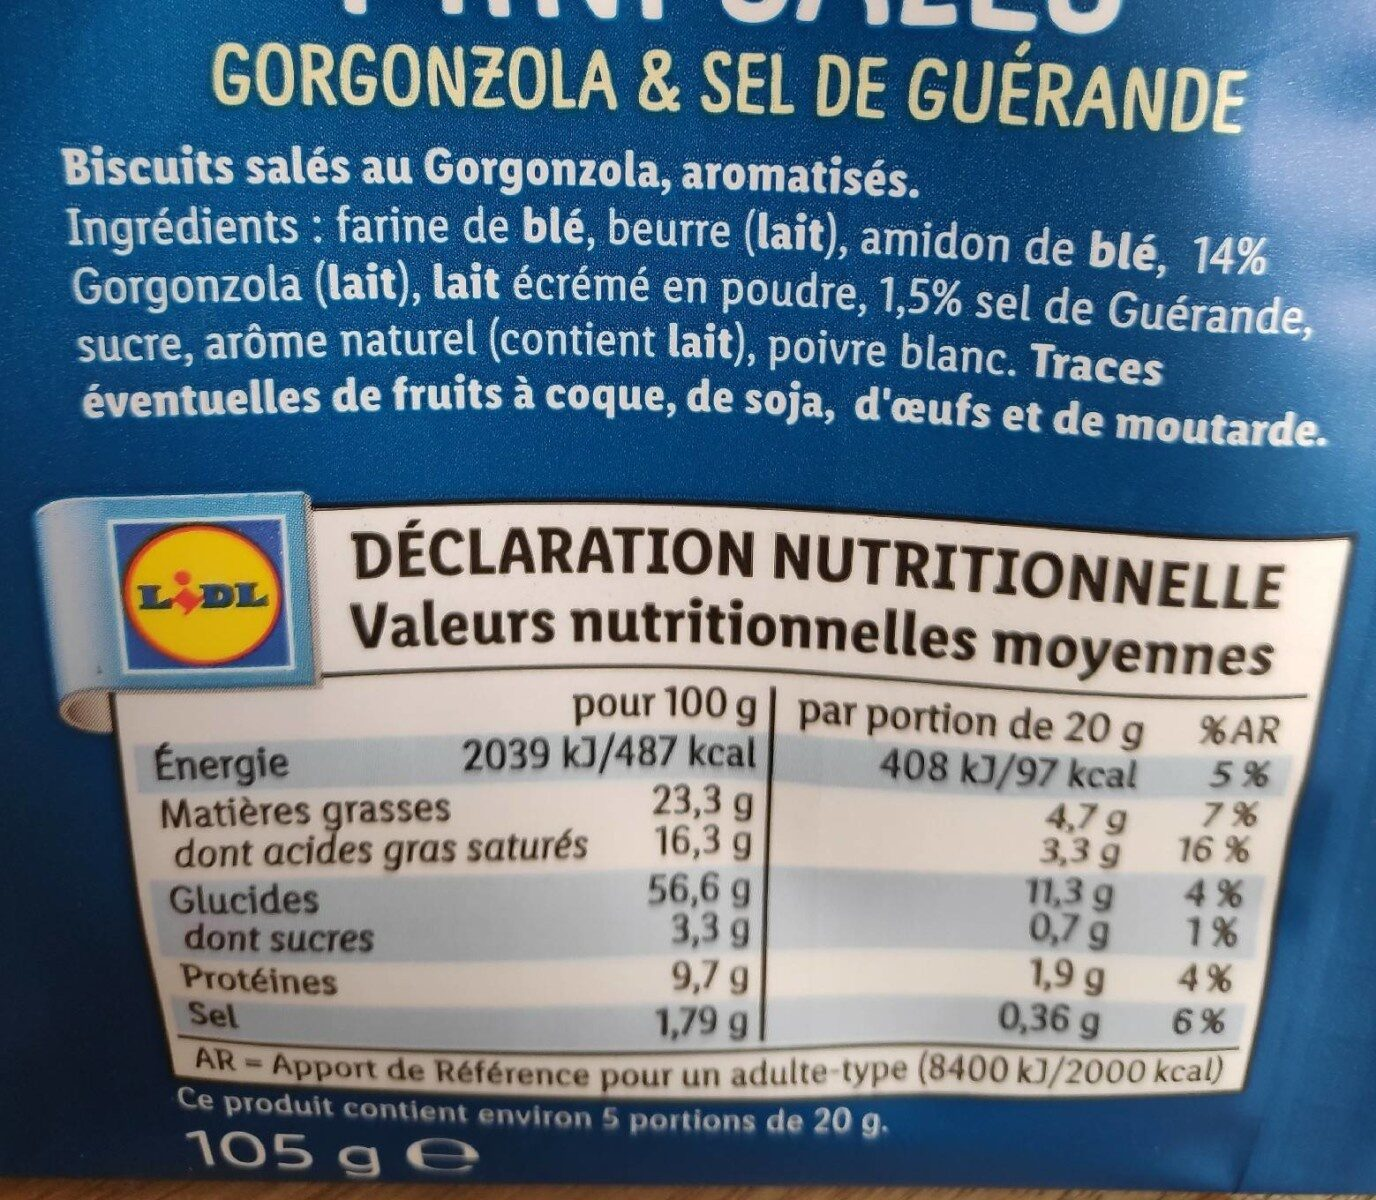 Mini salé - gorgonzola & sel de Guérande - Informations nutritionnelles - fr